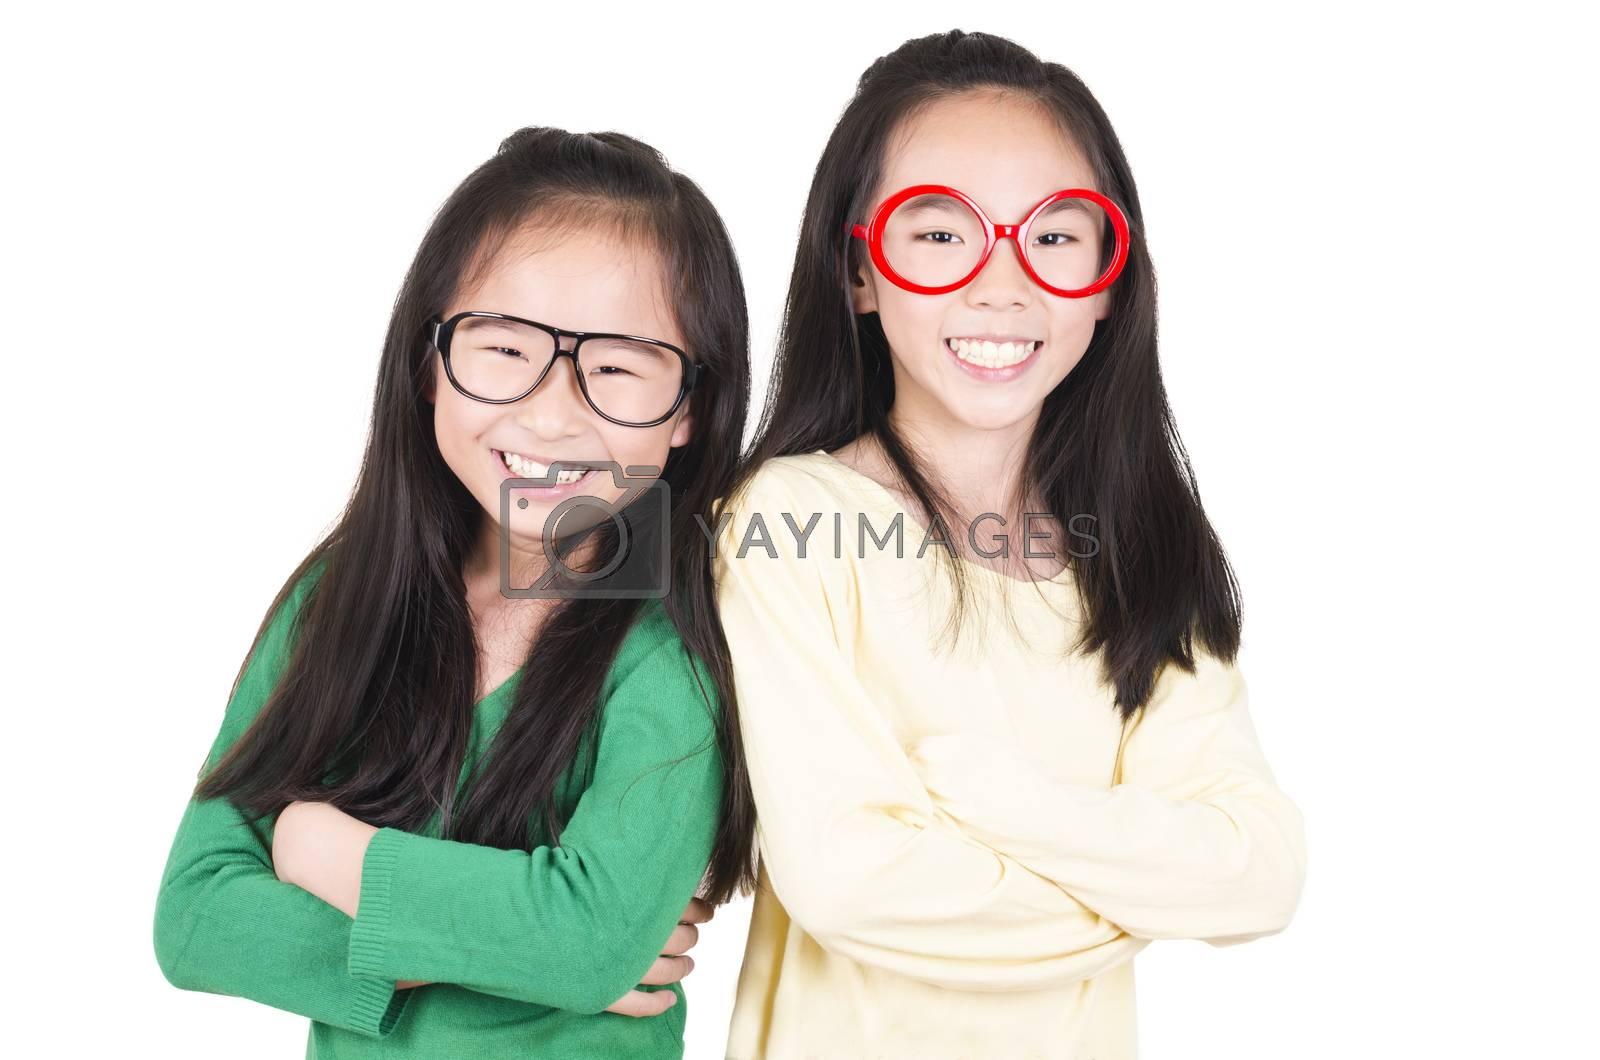 Royalty free image of Studio Portrait of Smiling Teenage Girls by FrankyLiu